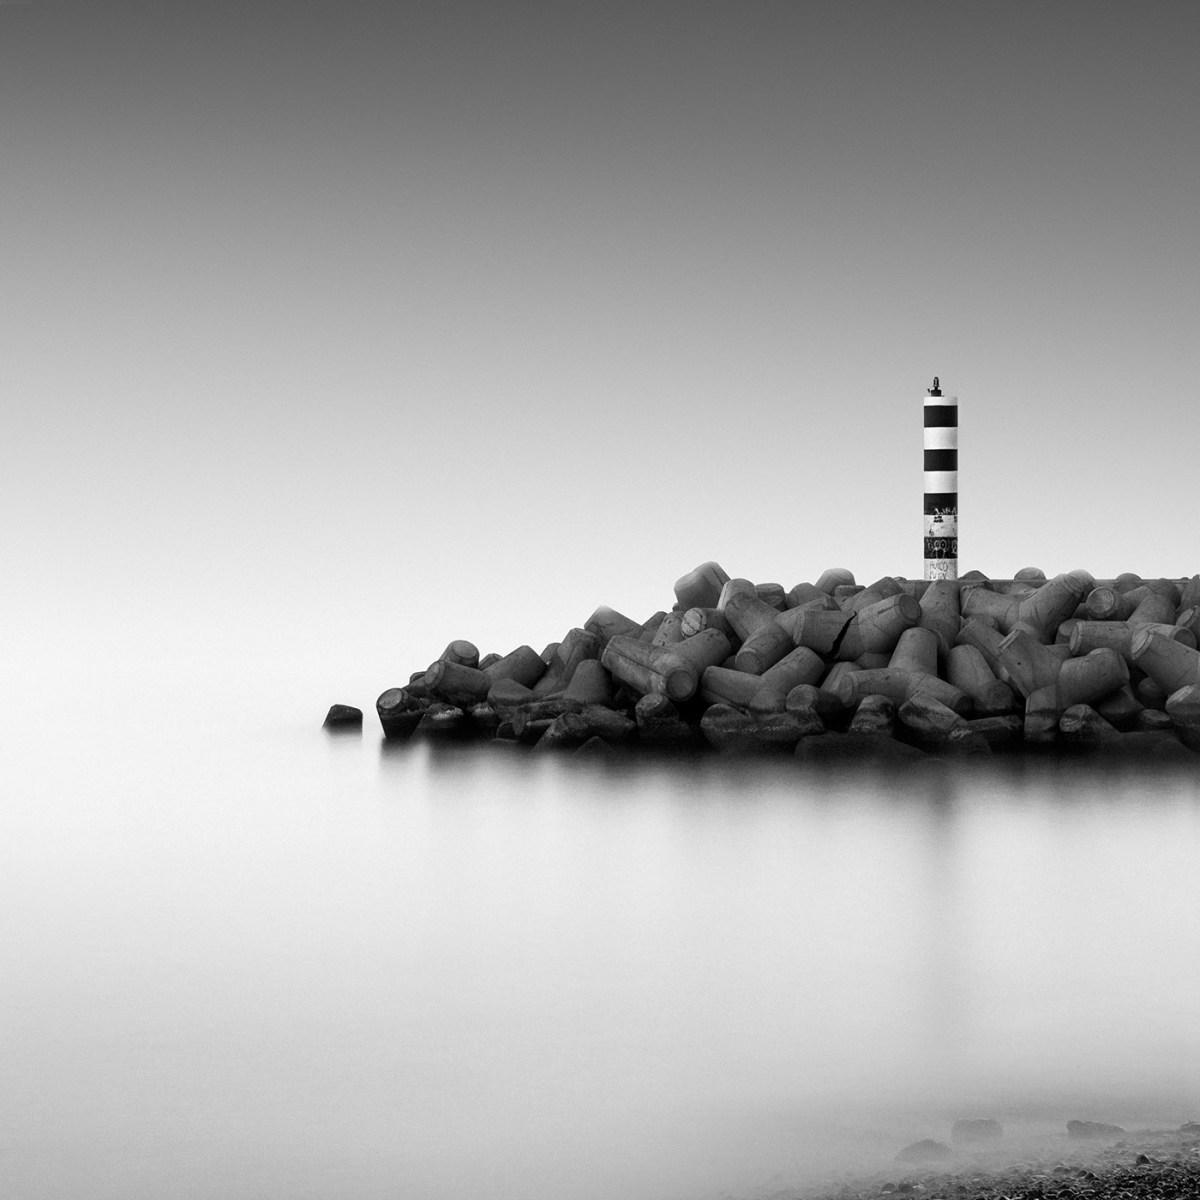 Arnaud-Bathiard-eternity-moss-and-fog-10